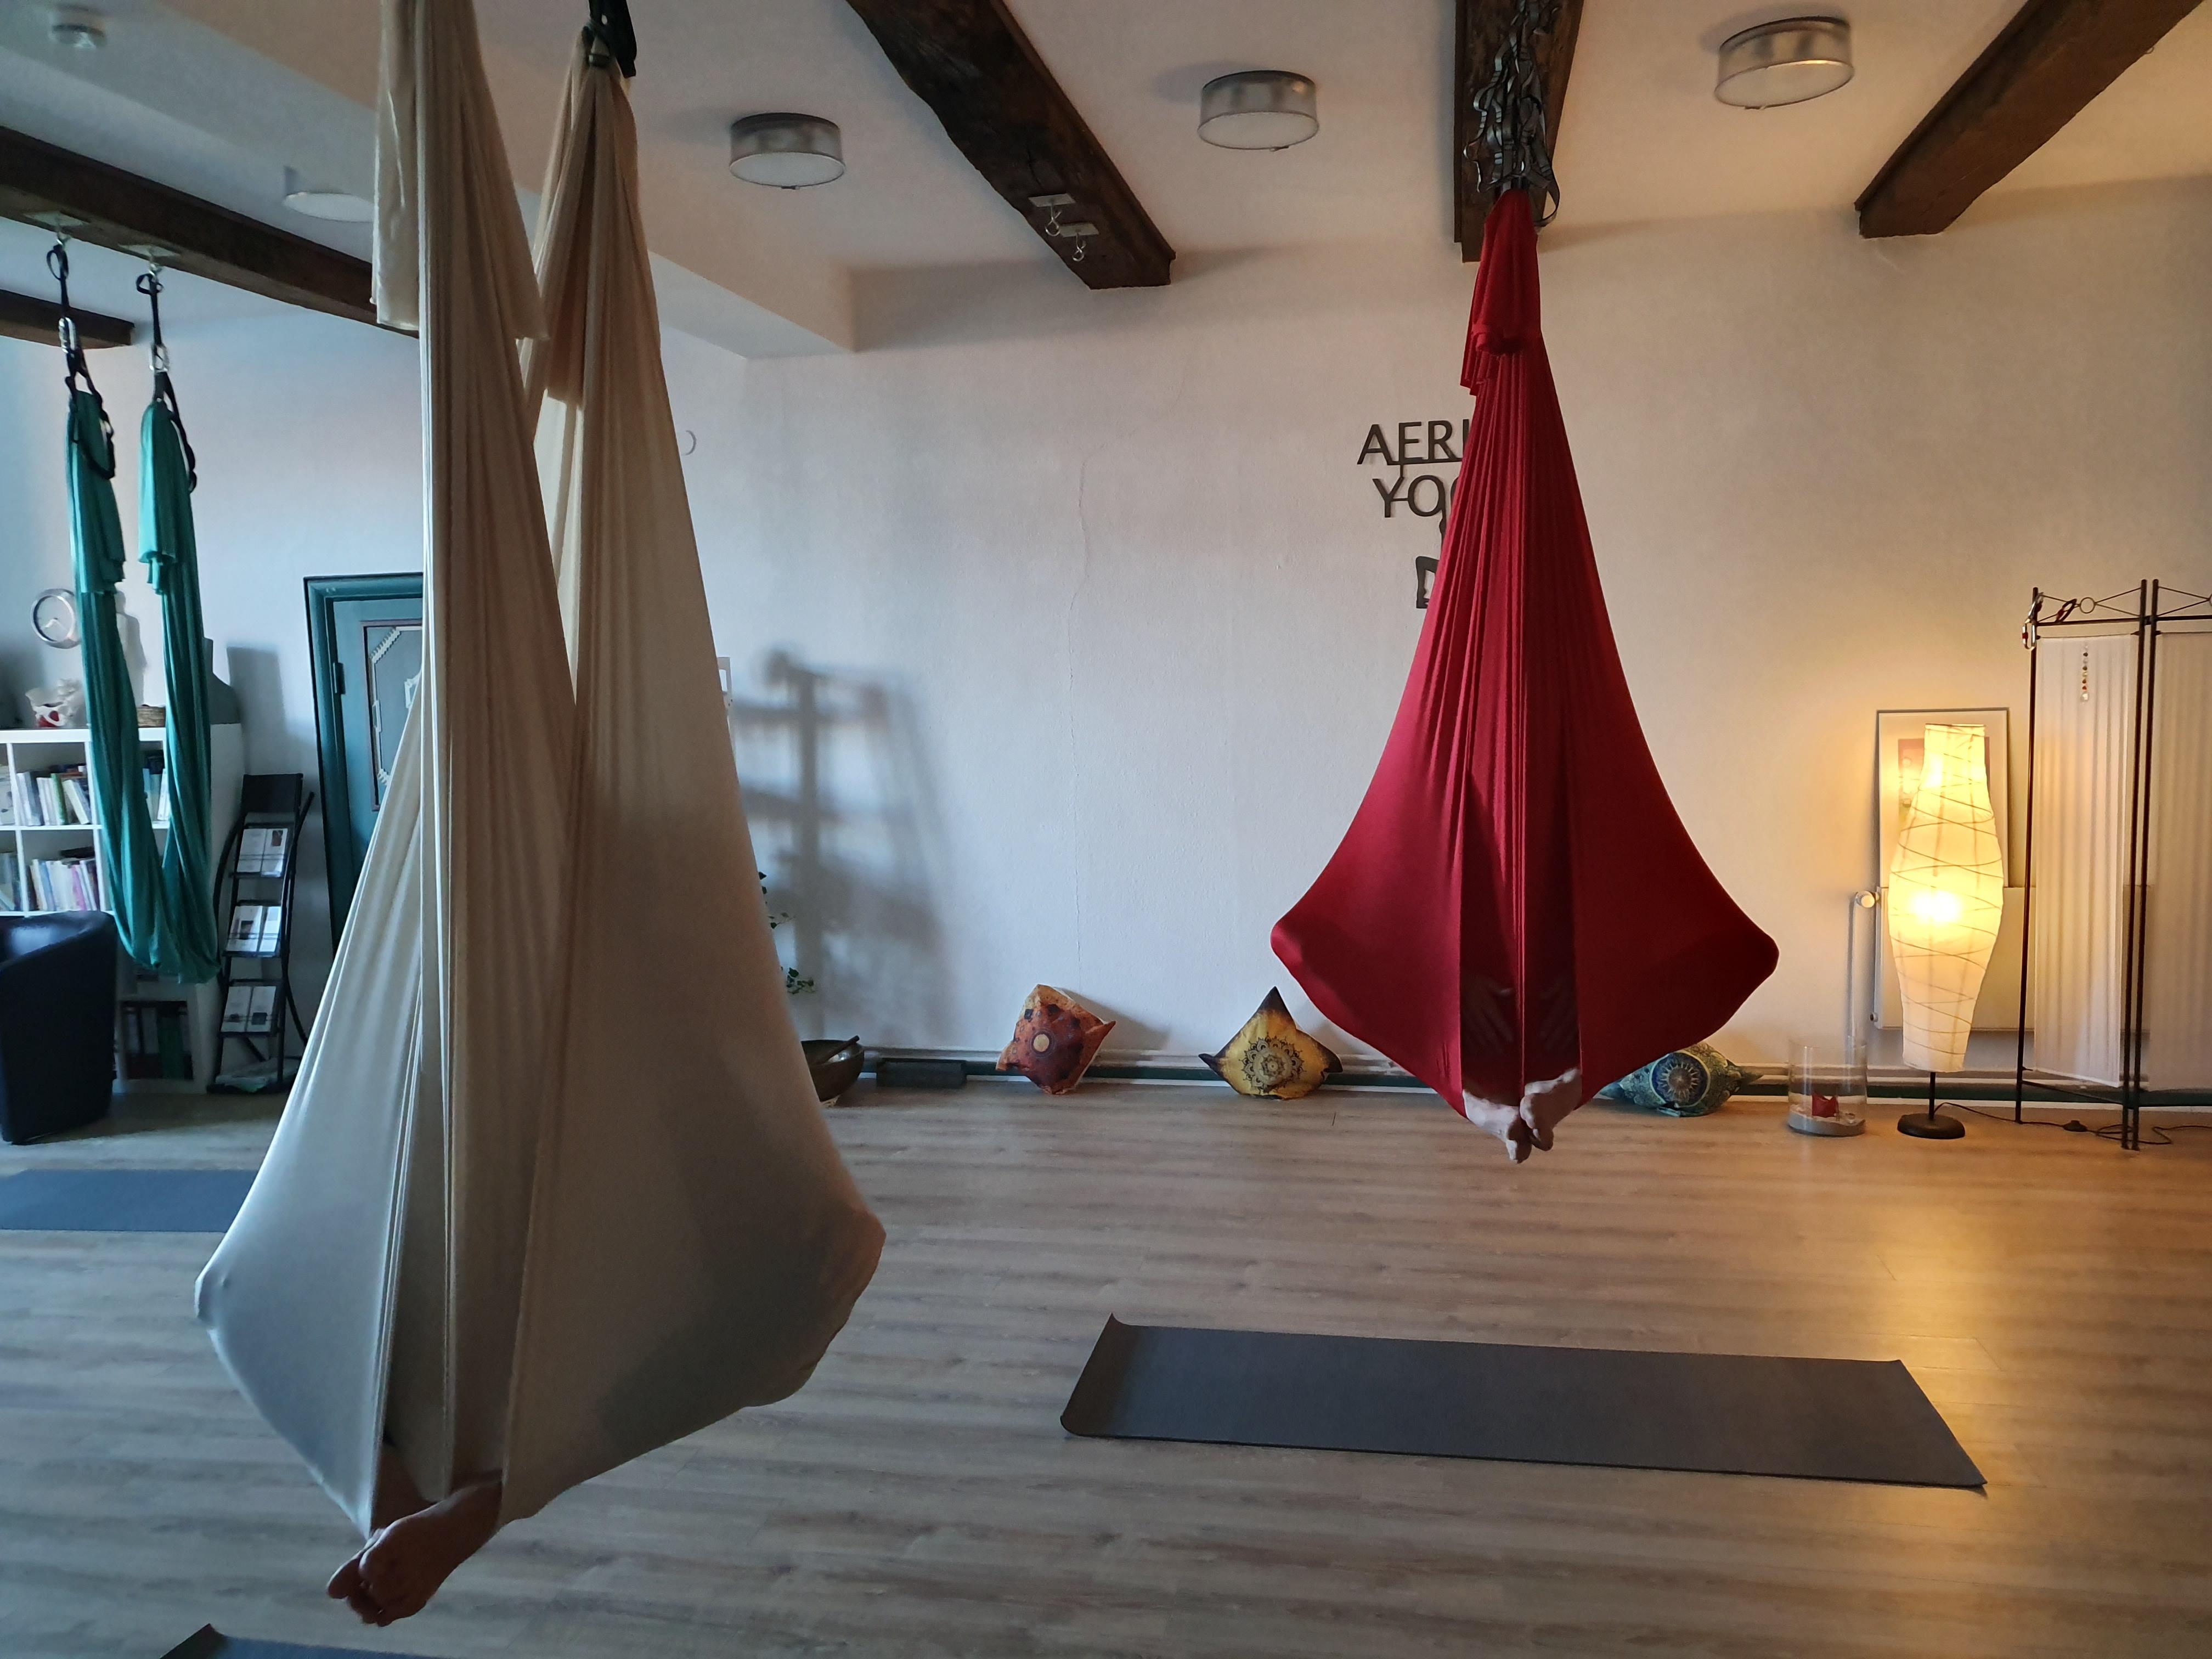 2021-Aerial Yoga-Daniela Lafrentz.jpg